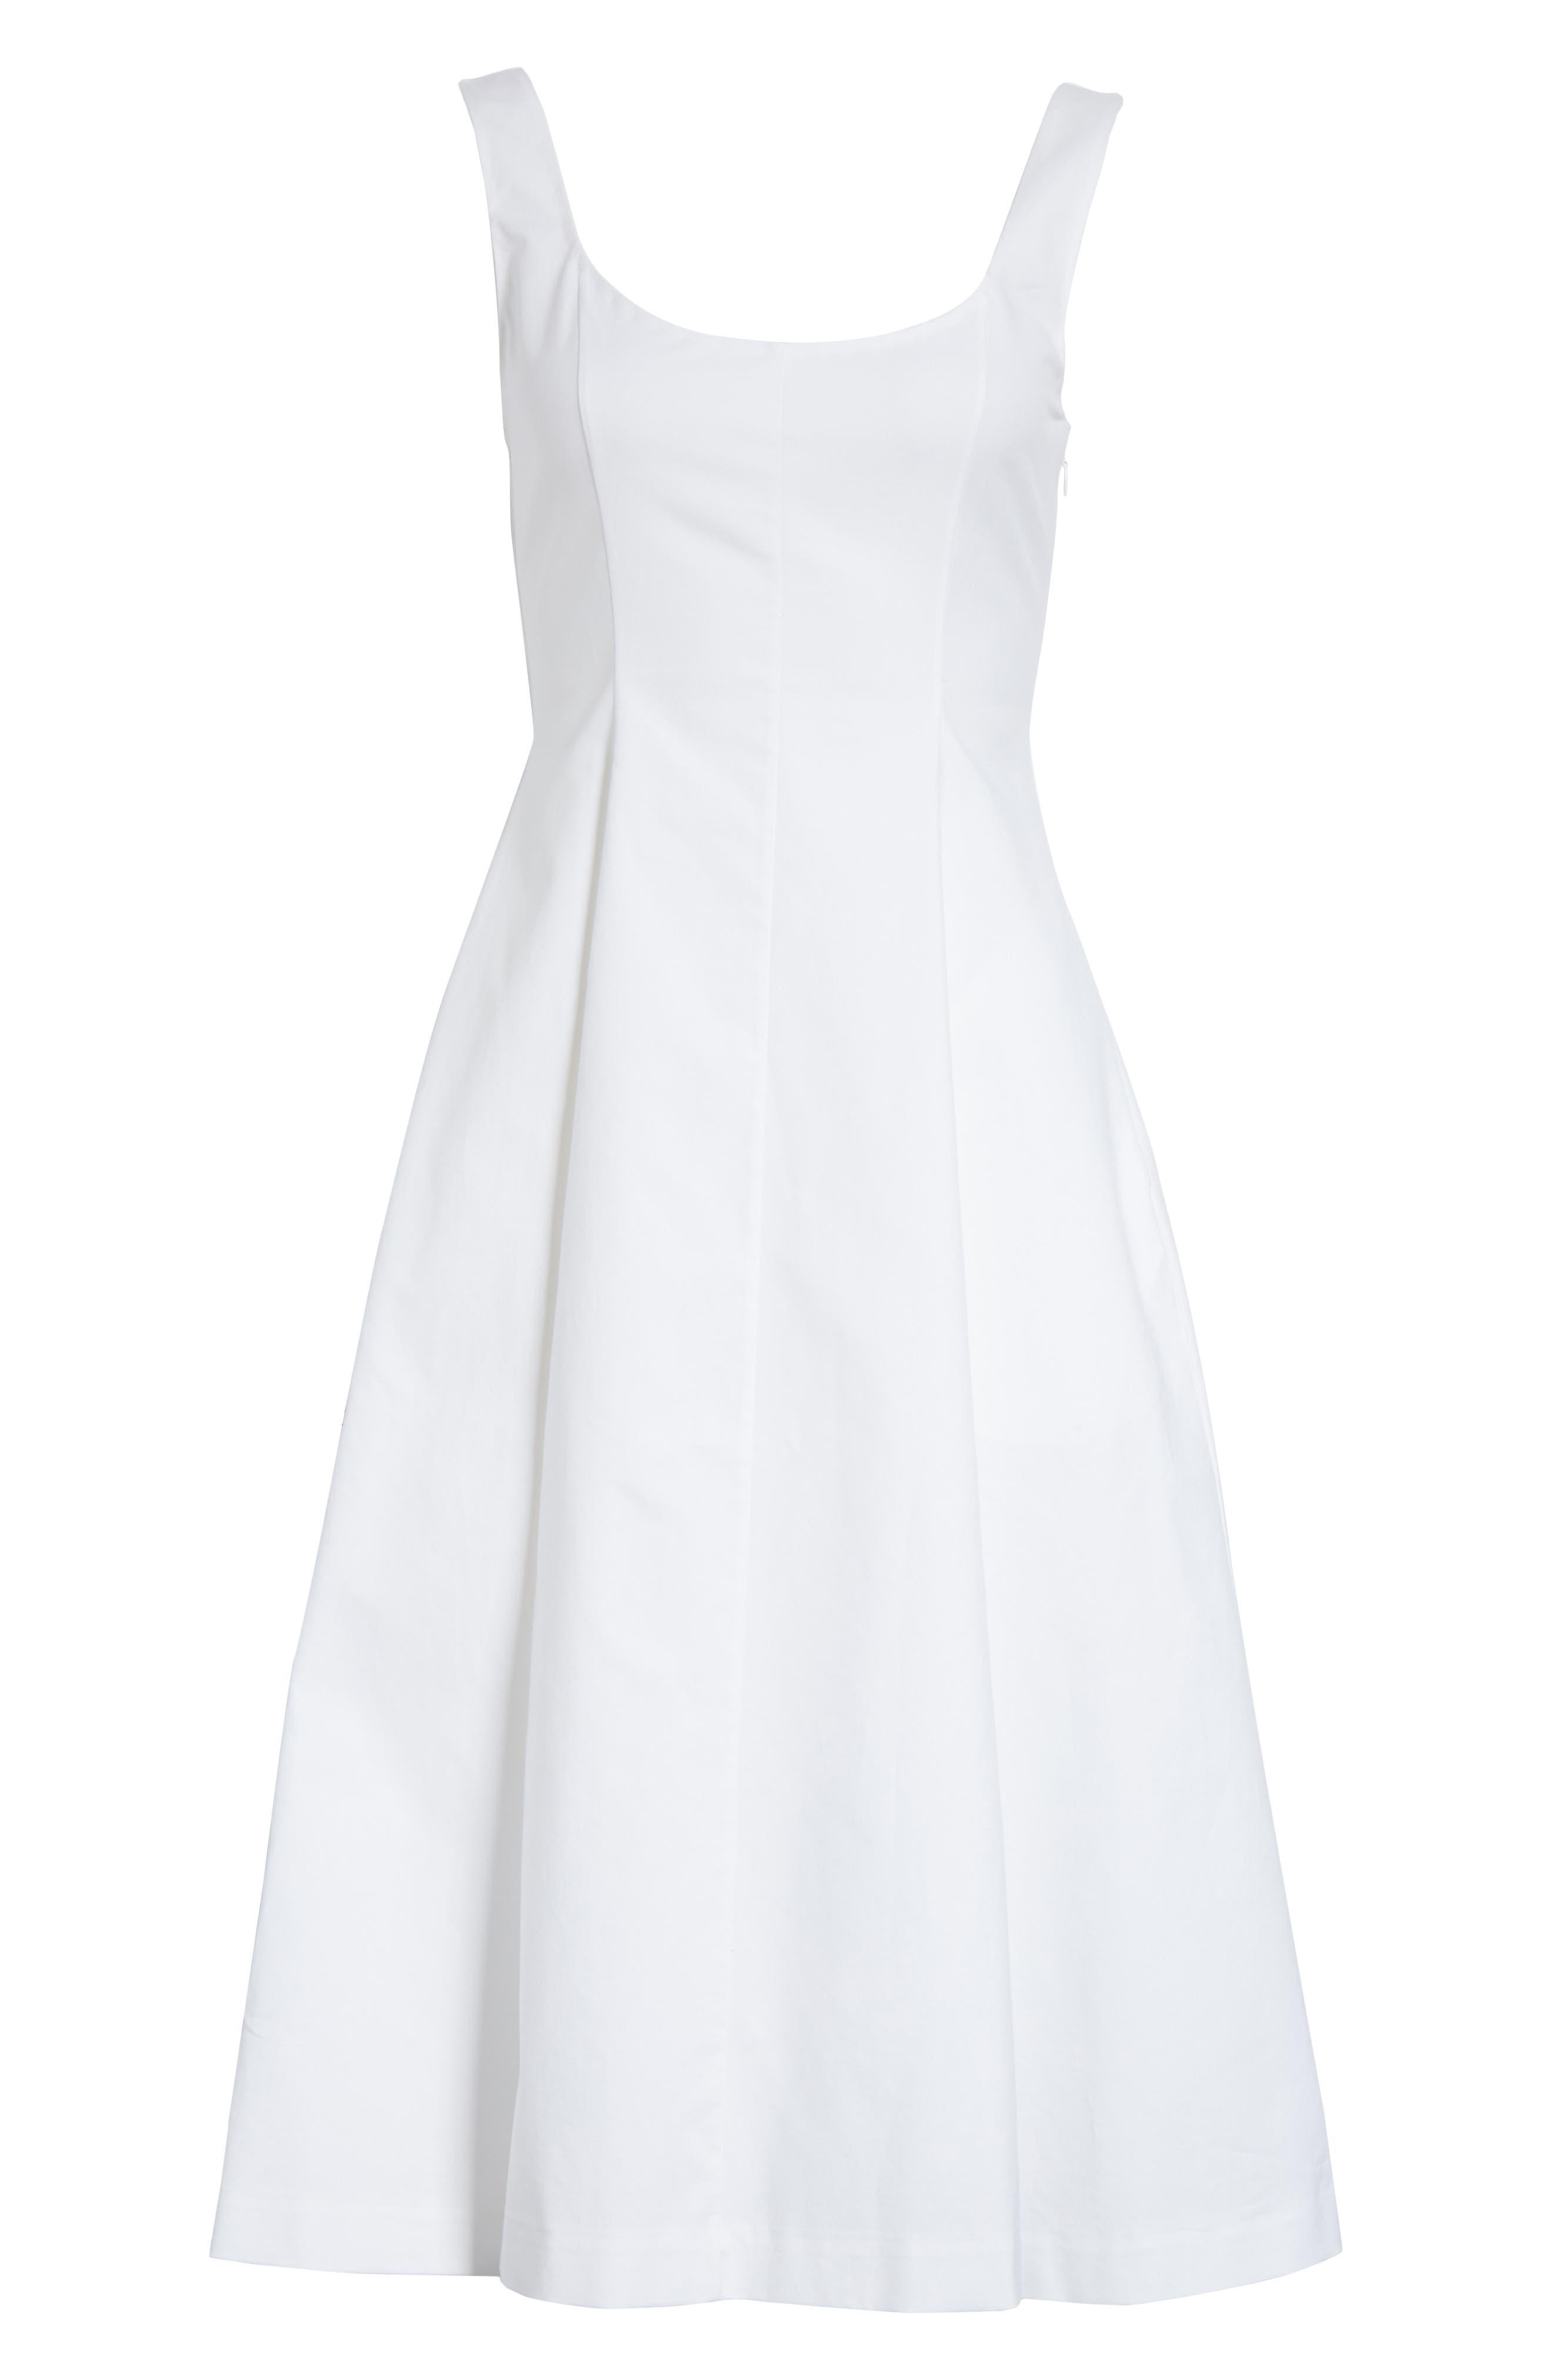 Cindy Poplin Tank Dress,                             Alternate thumbnail 6, color,                             100